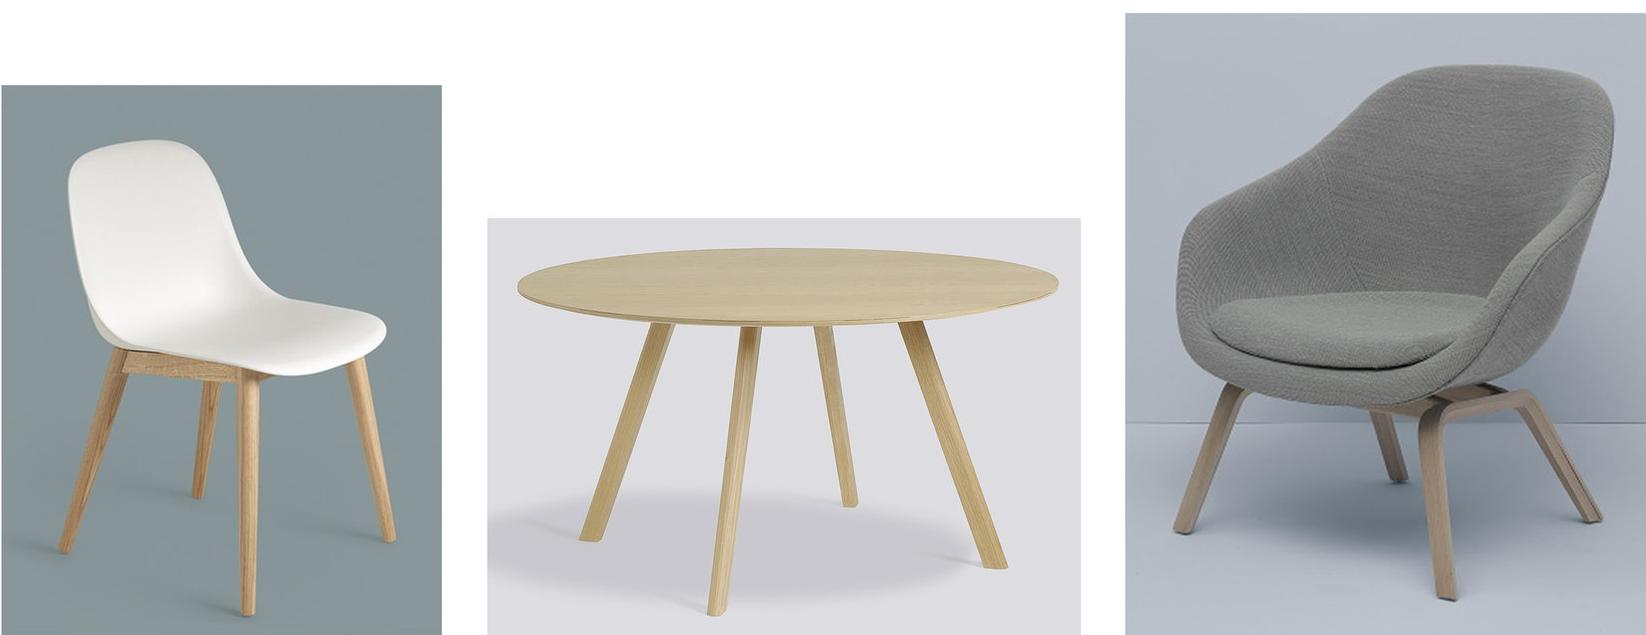 Eve Waldron Design, Hay furniture.JPG